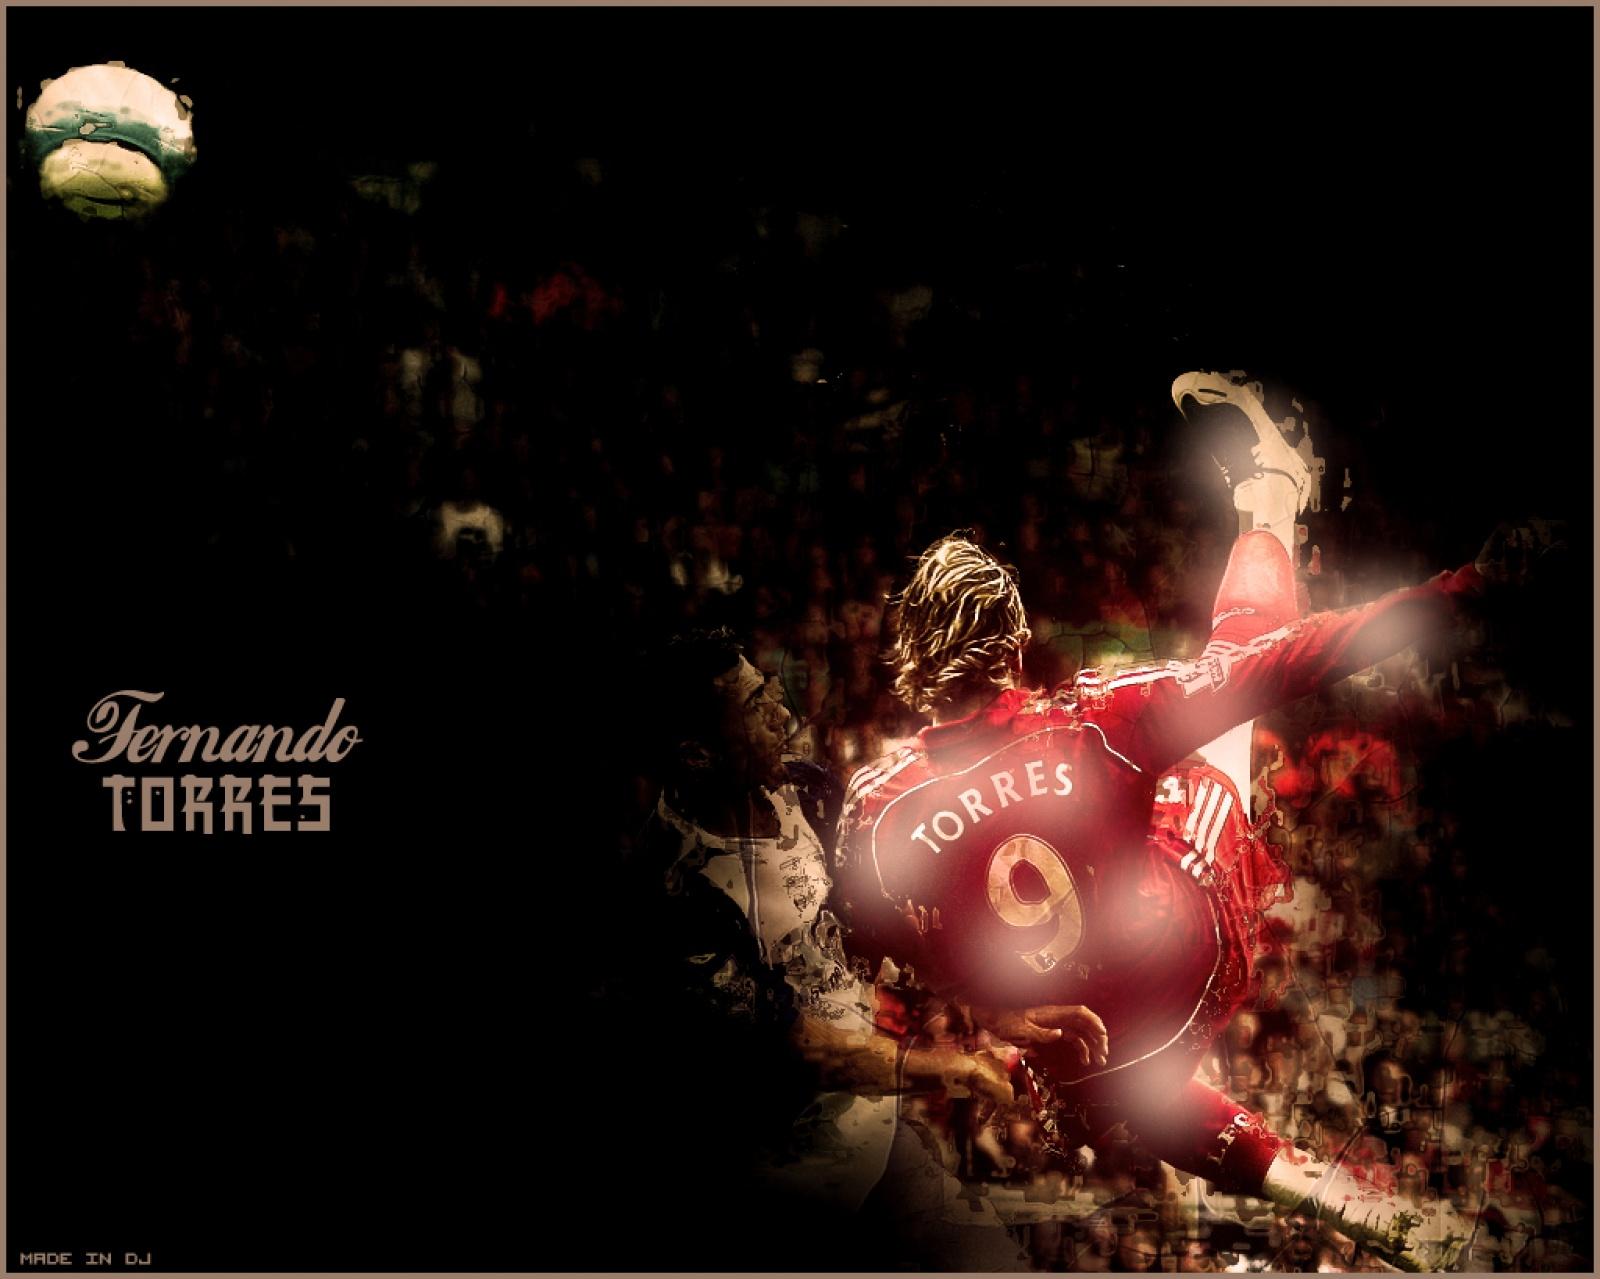 Fernando Torres Player Wallpapers   8670 1600x1279